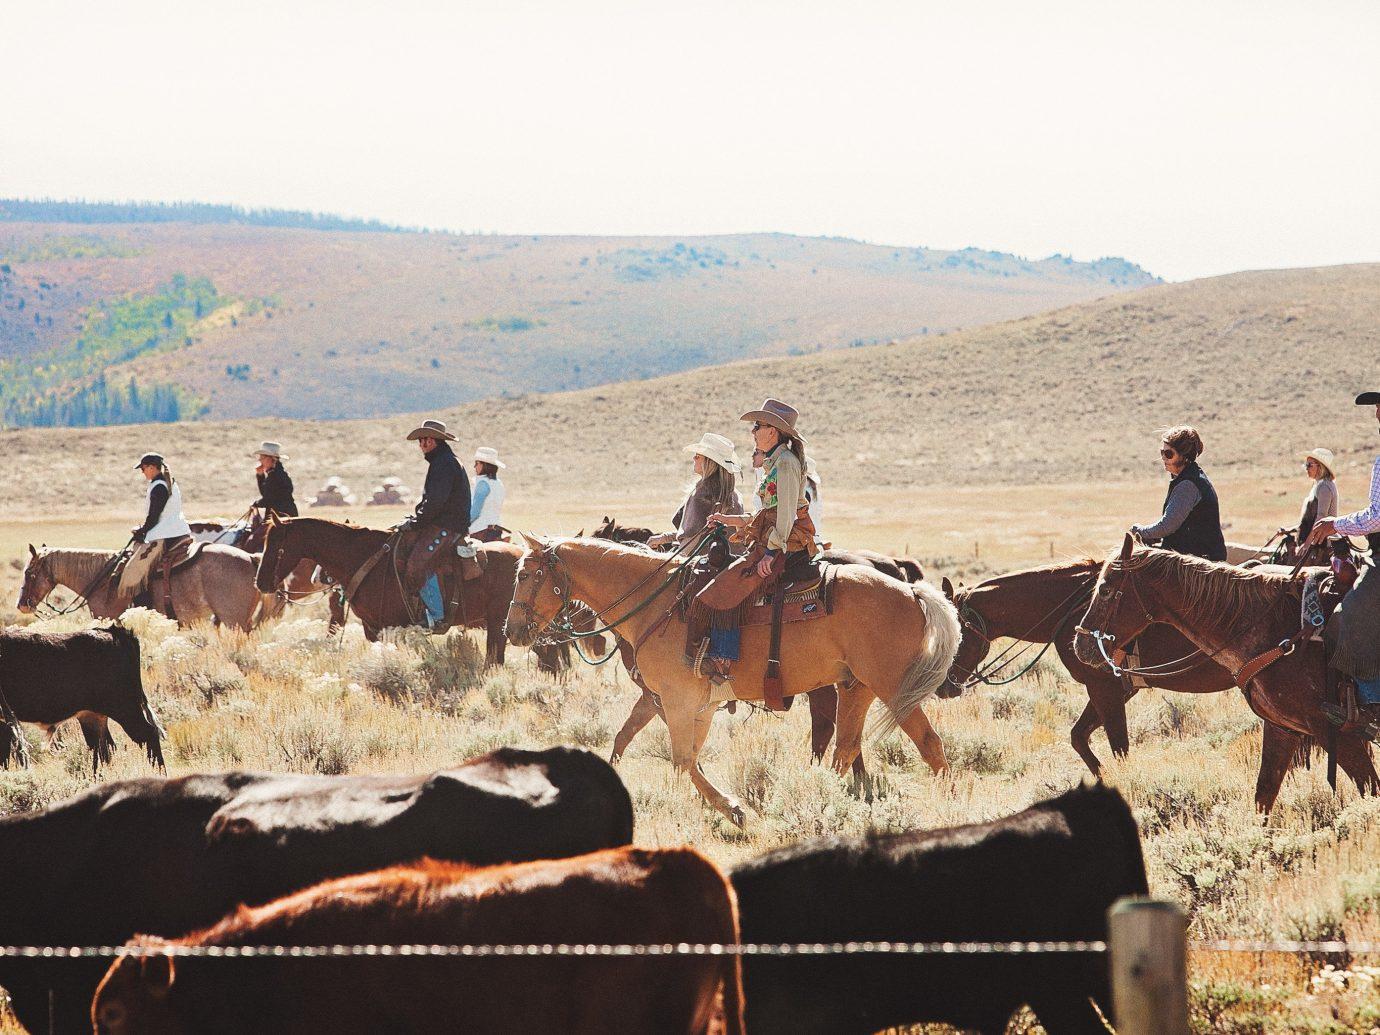 Hotels Outdoors + Adventure Trip Ideas grass outdoor sky mammal mountain pack animal mustang horse herd landscape horse like mammal Ranch bovine